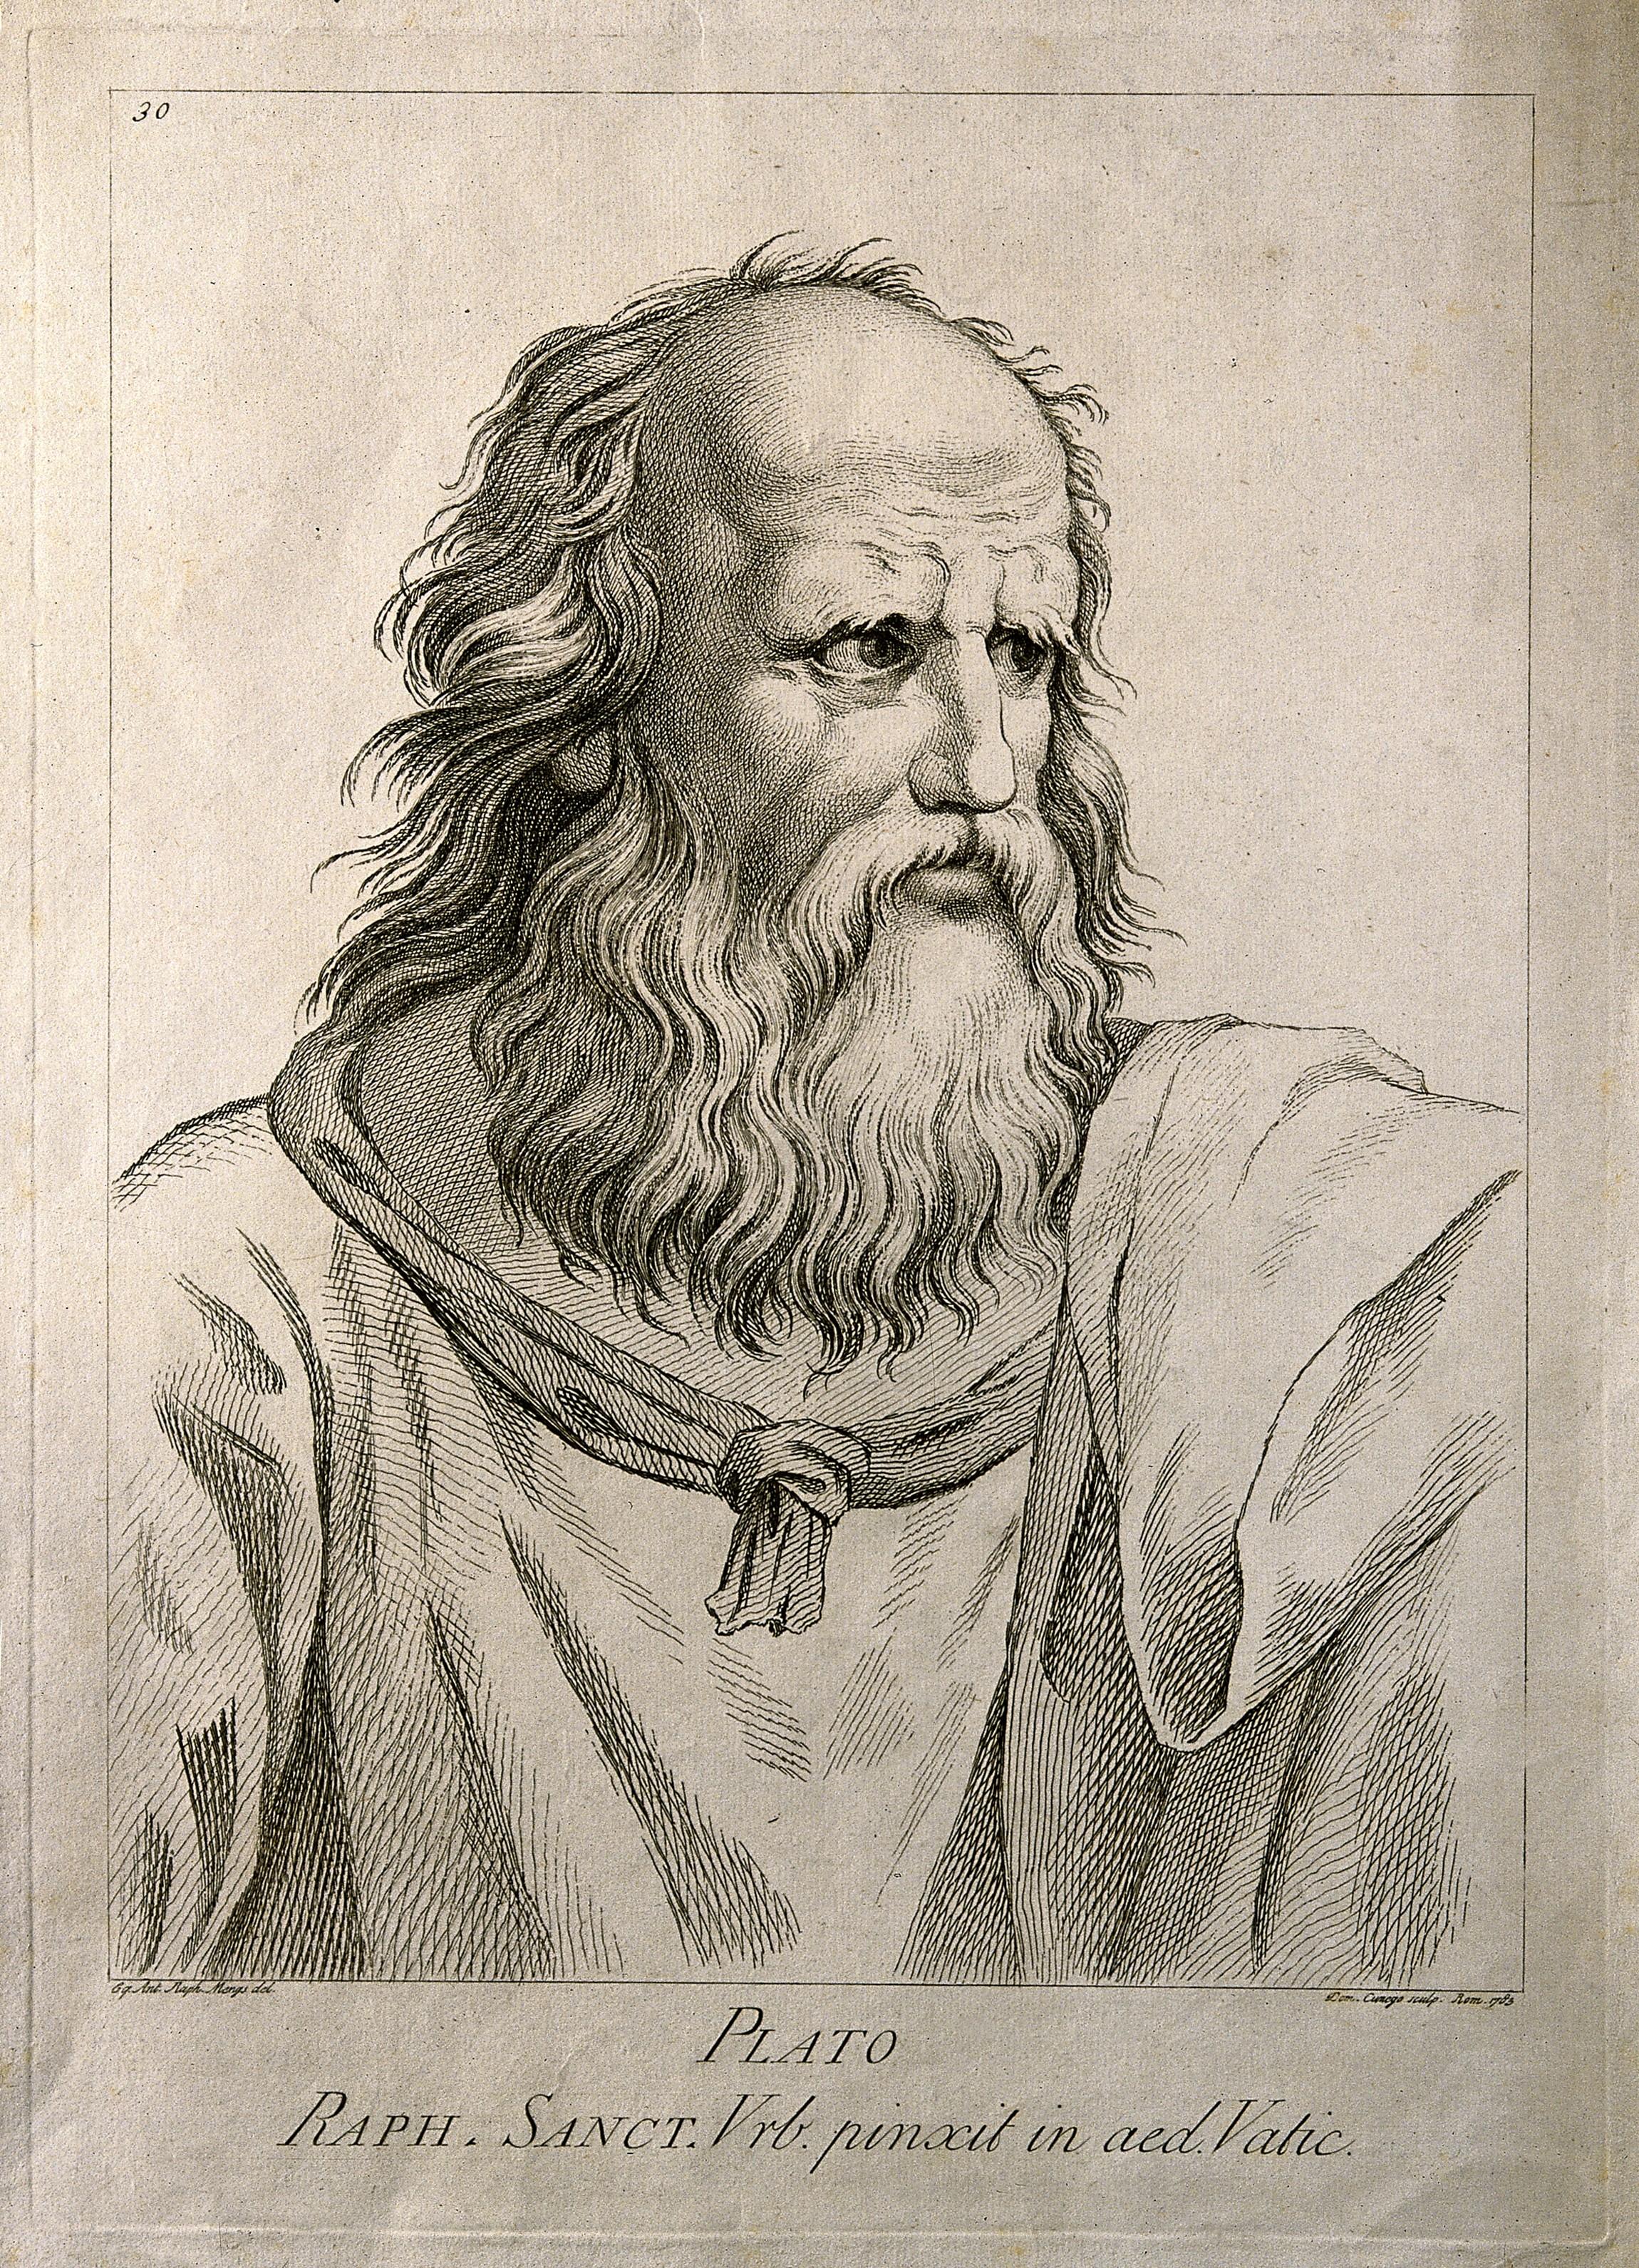 Wut macht politisch - Platon - Etching by D. Cunego